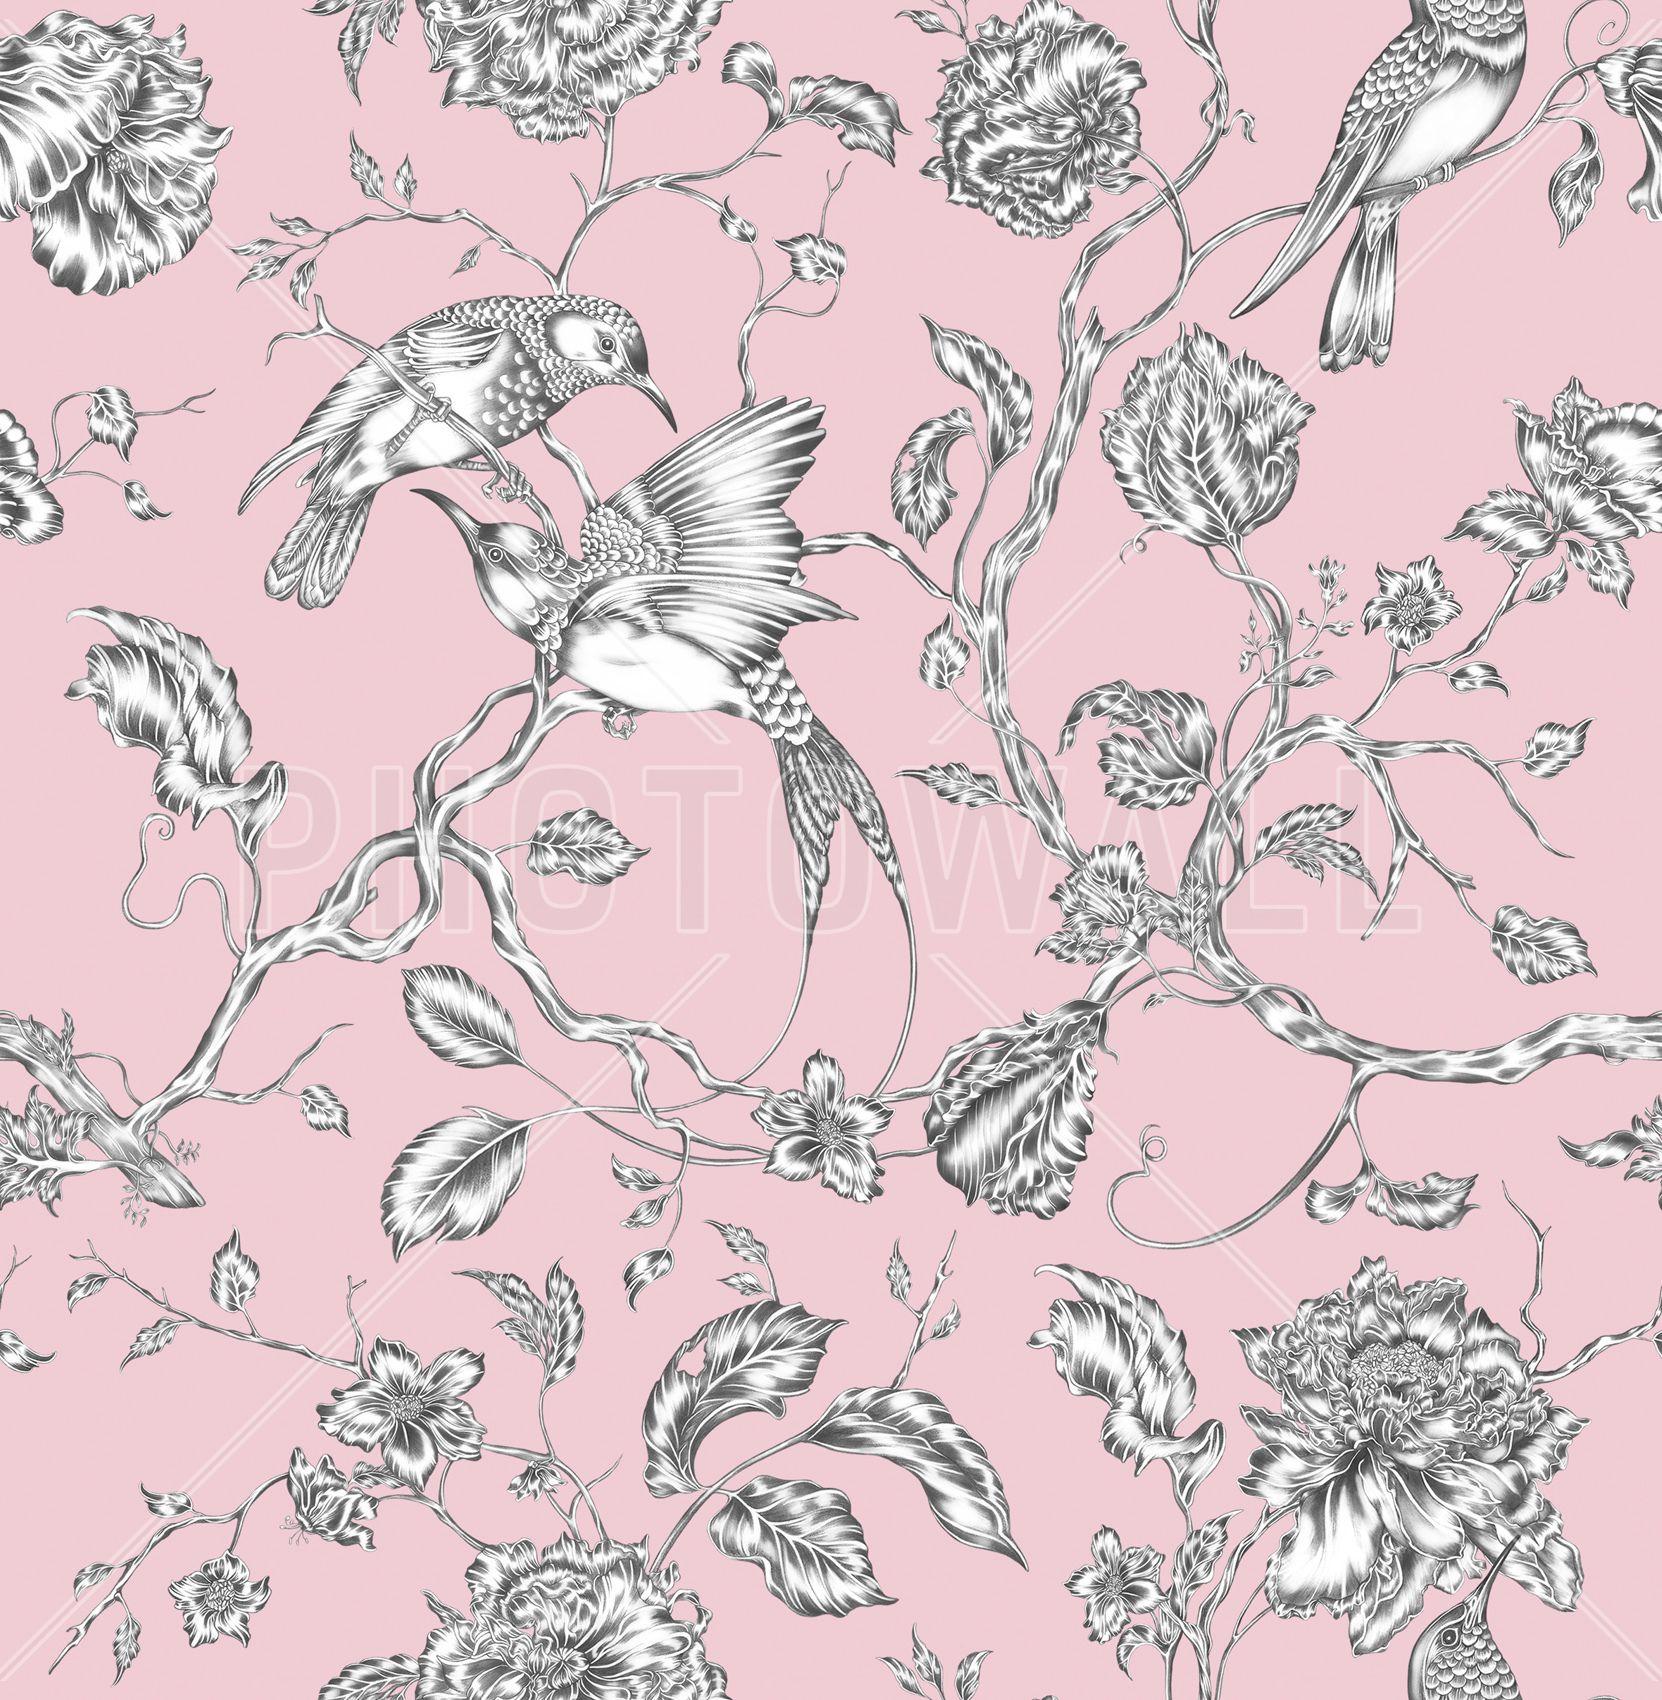 Papier Peint Petit Salon hummingbird pink - wall mural & photo wallpaper - photowall